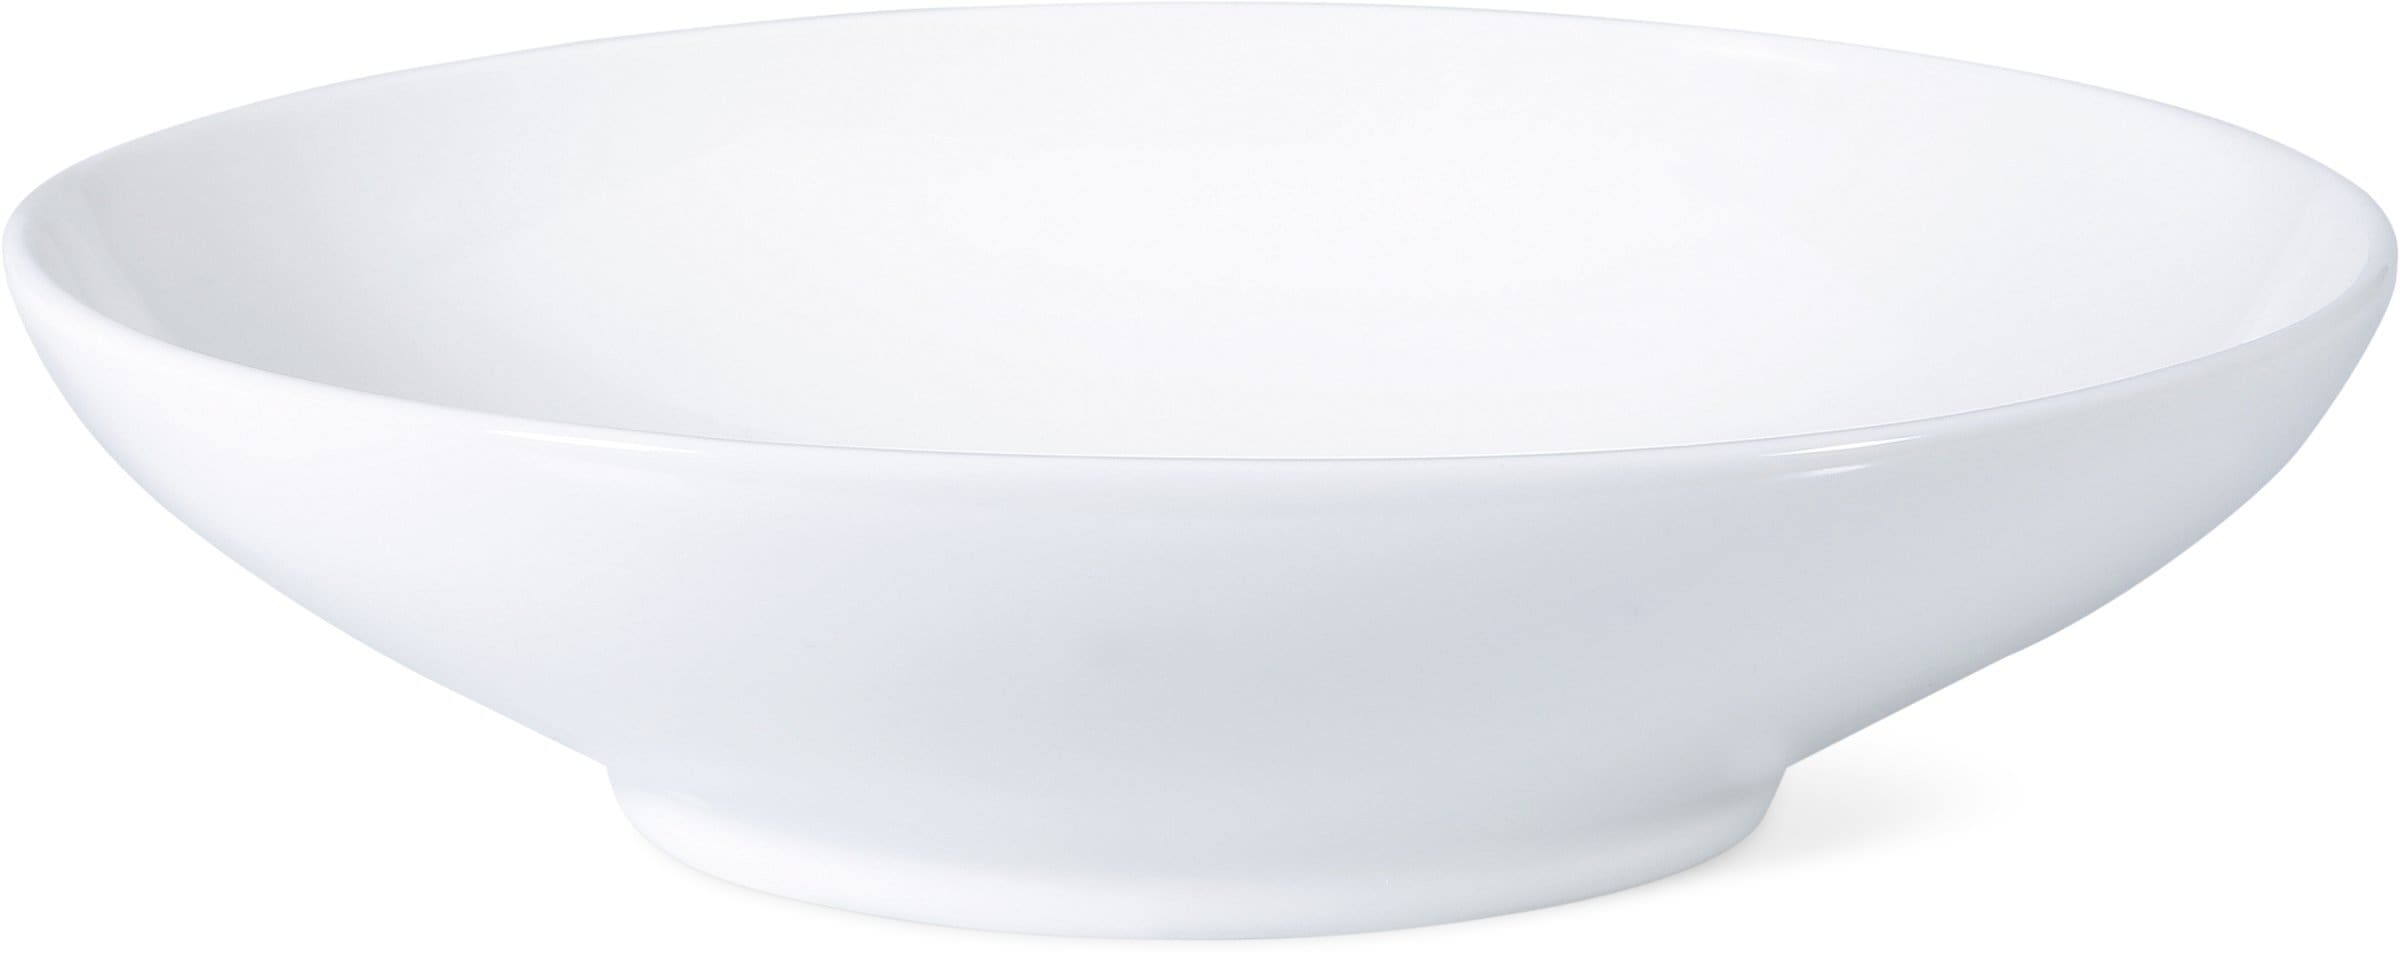 Cucina & Tavola PURE Bol 21x16.5cm Saladiers